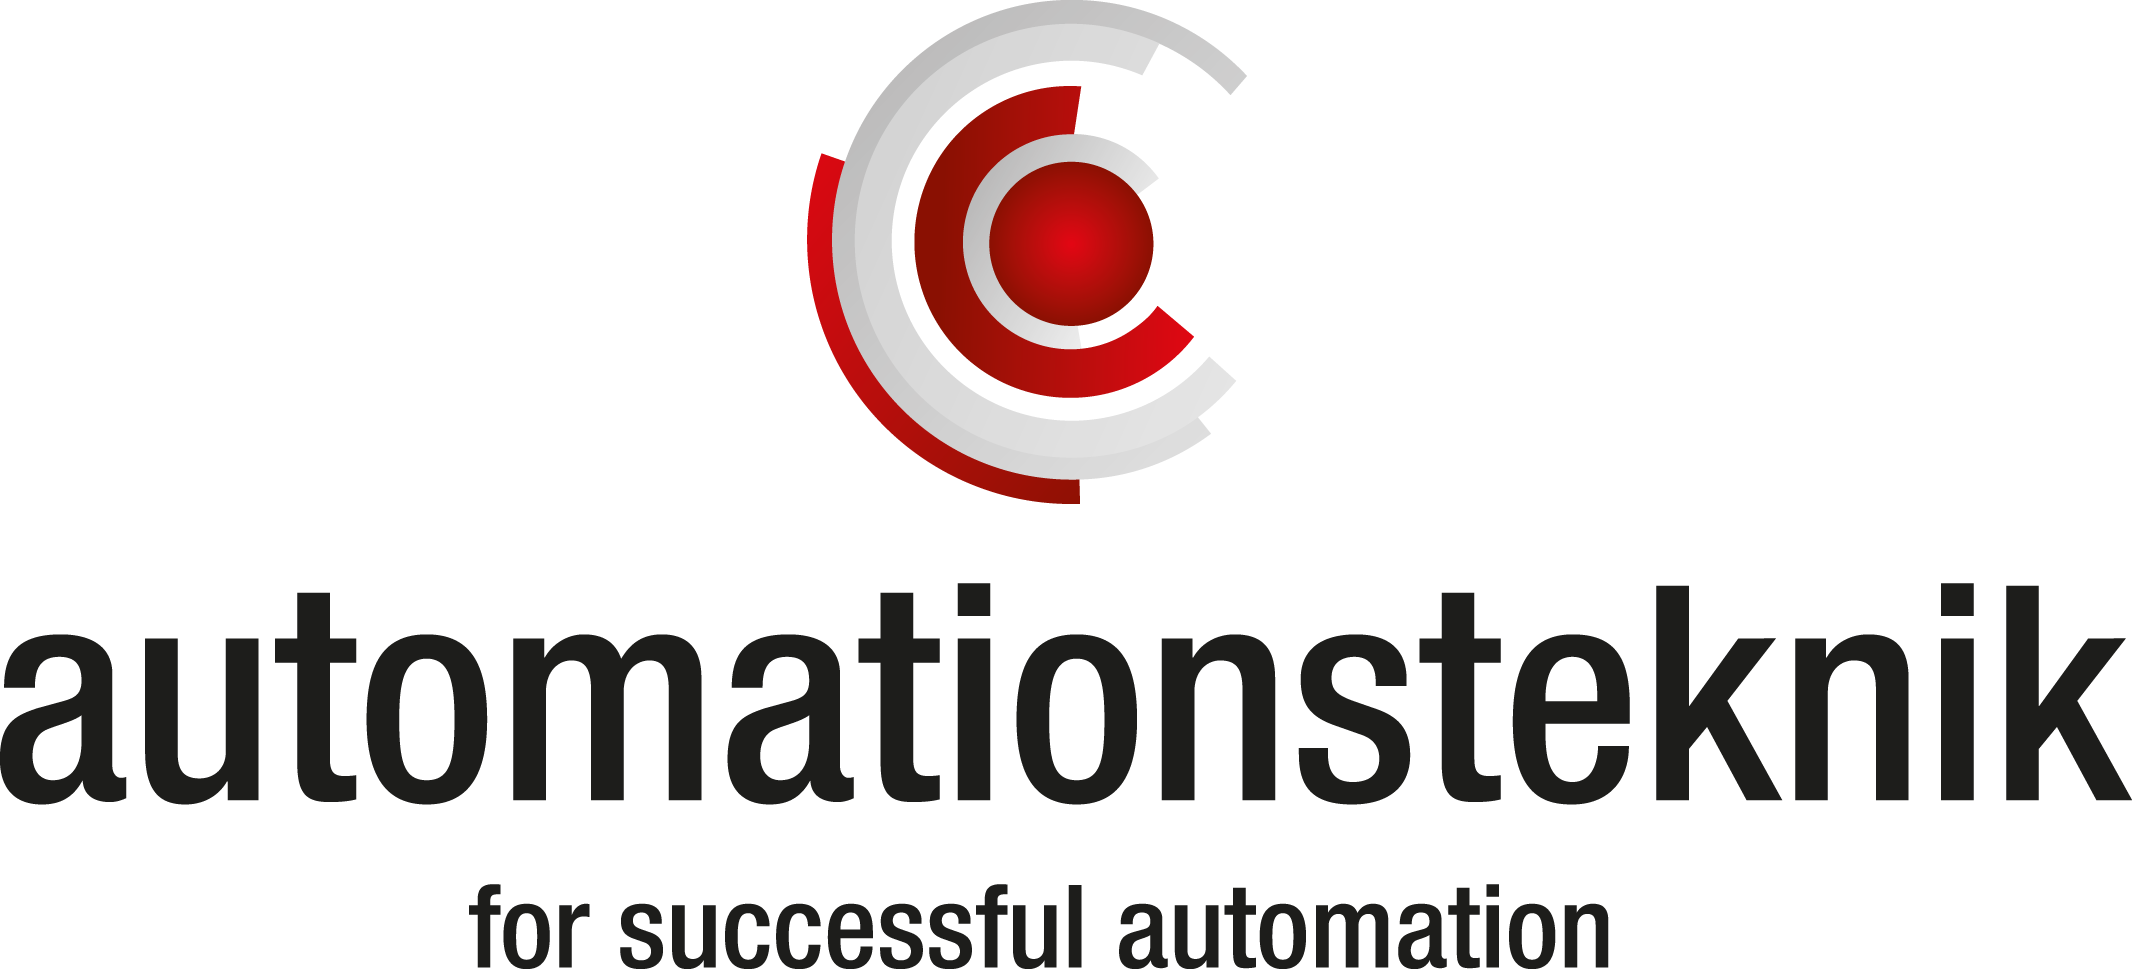 Automationsteknik